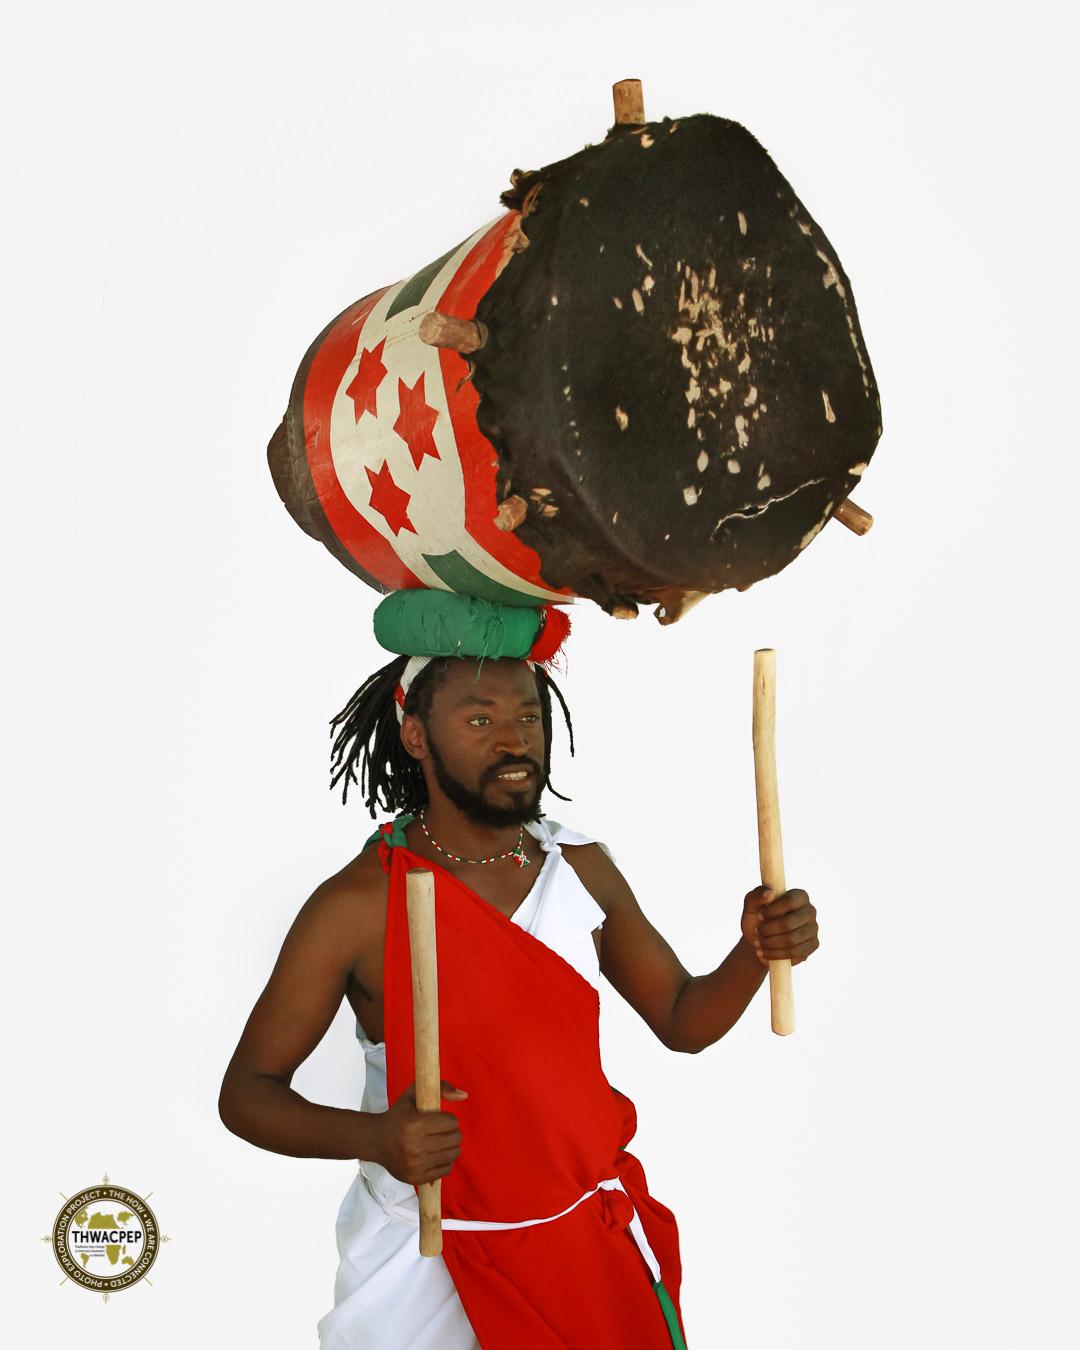 Burundi - The THWACPEP Project